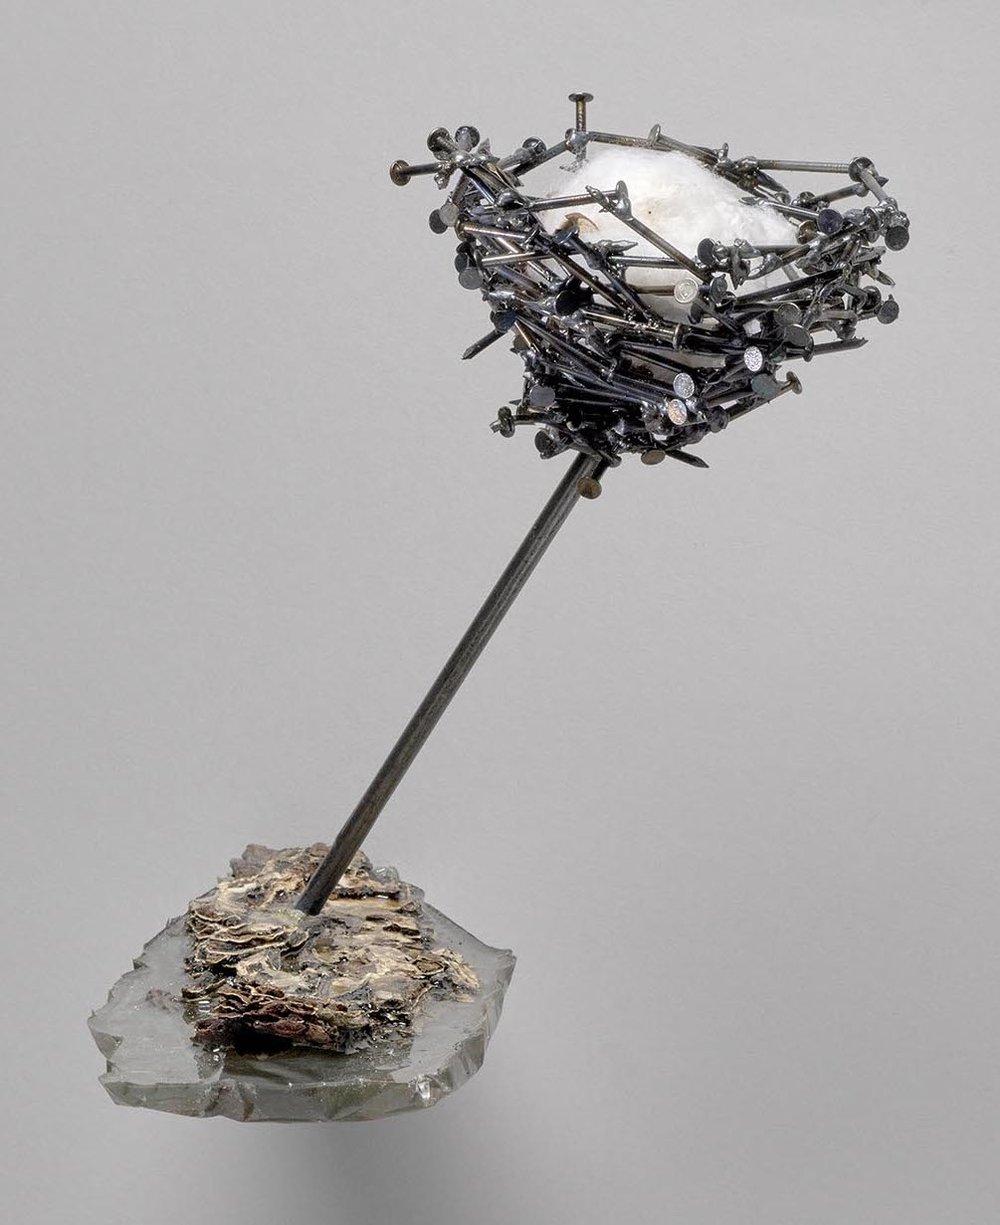 Cindy Lisica Gallery - Shang-Yi Hua - _Elevation_ - 8.5 x 10 x 14 - resin, bark, nails, cotton flower, steel - 2018 - $600.JPG